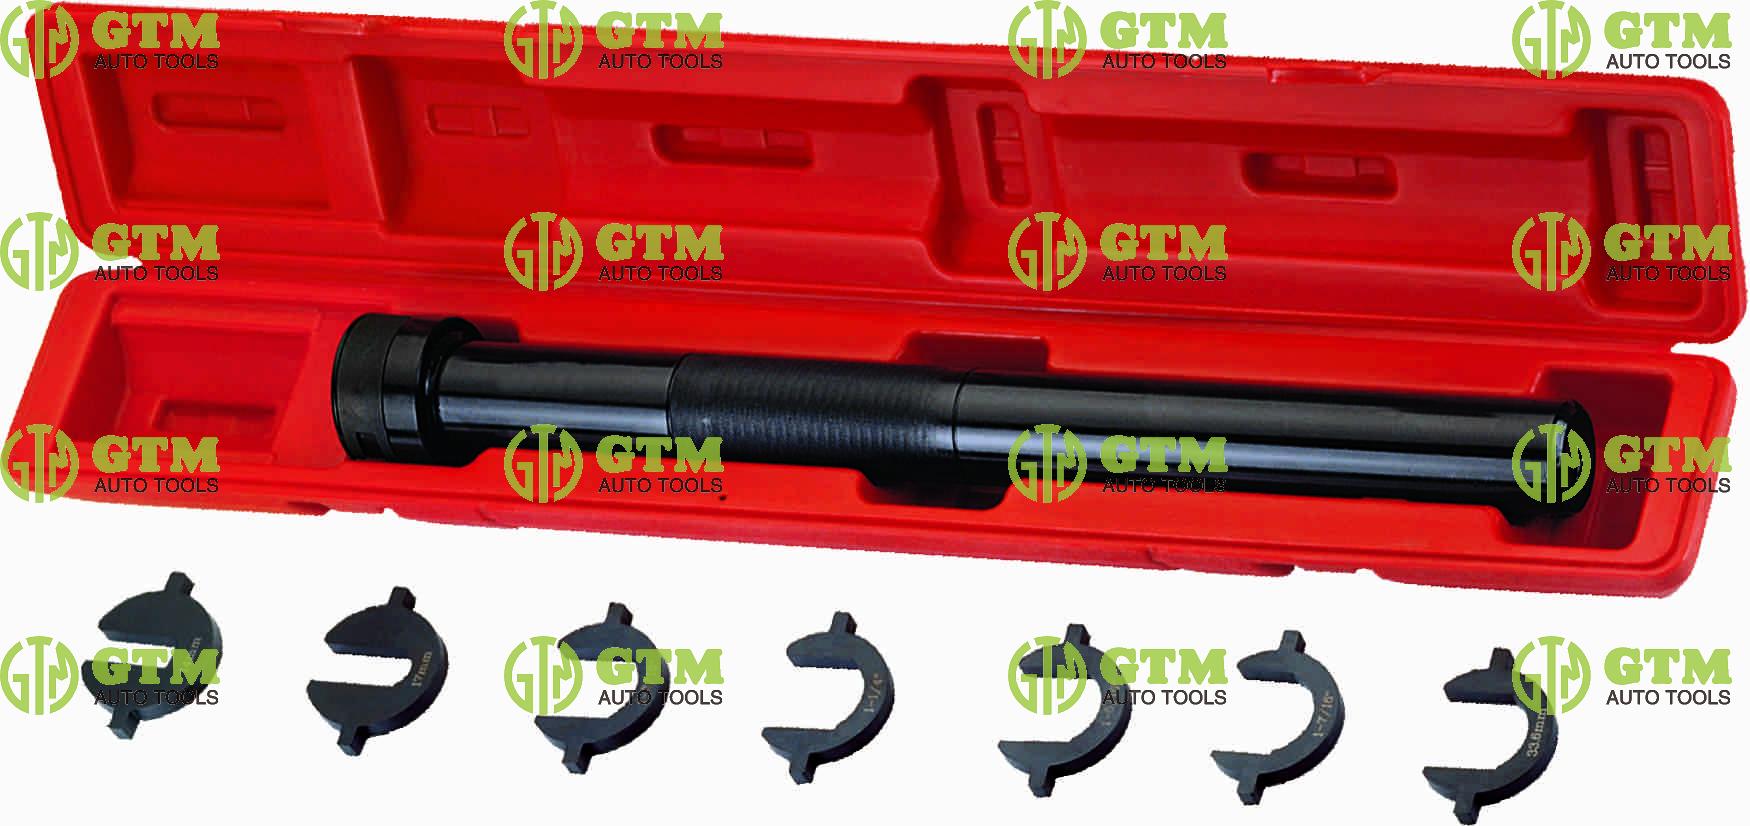 GTM-25206 INNER TIE ROD TOOL (8PCS)